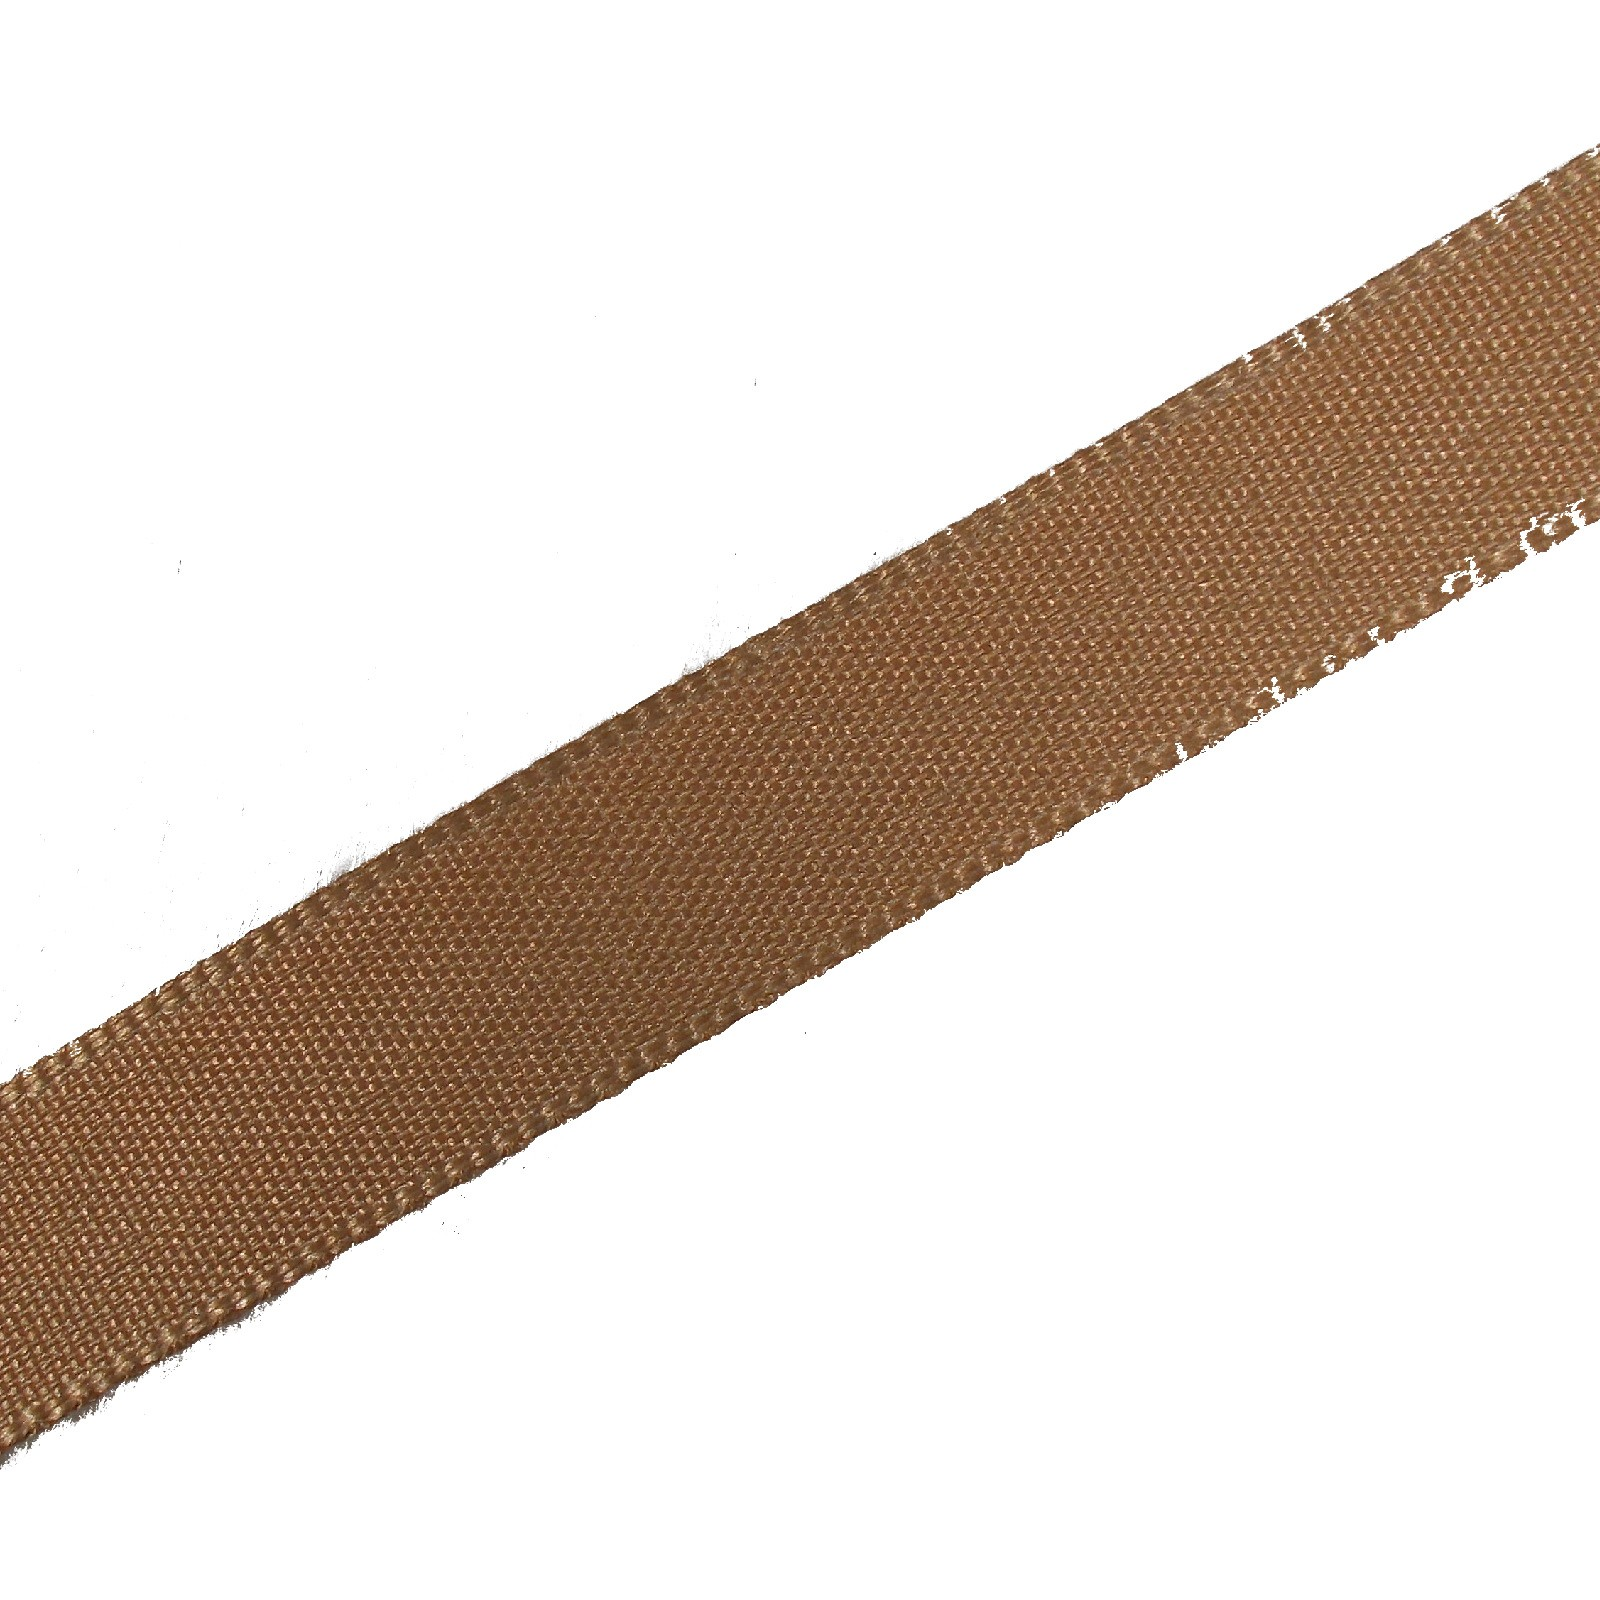 Berisfords Seam Binding Polyester Ribbon Tape 12mm wide Dark Beige 2 metre length